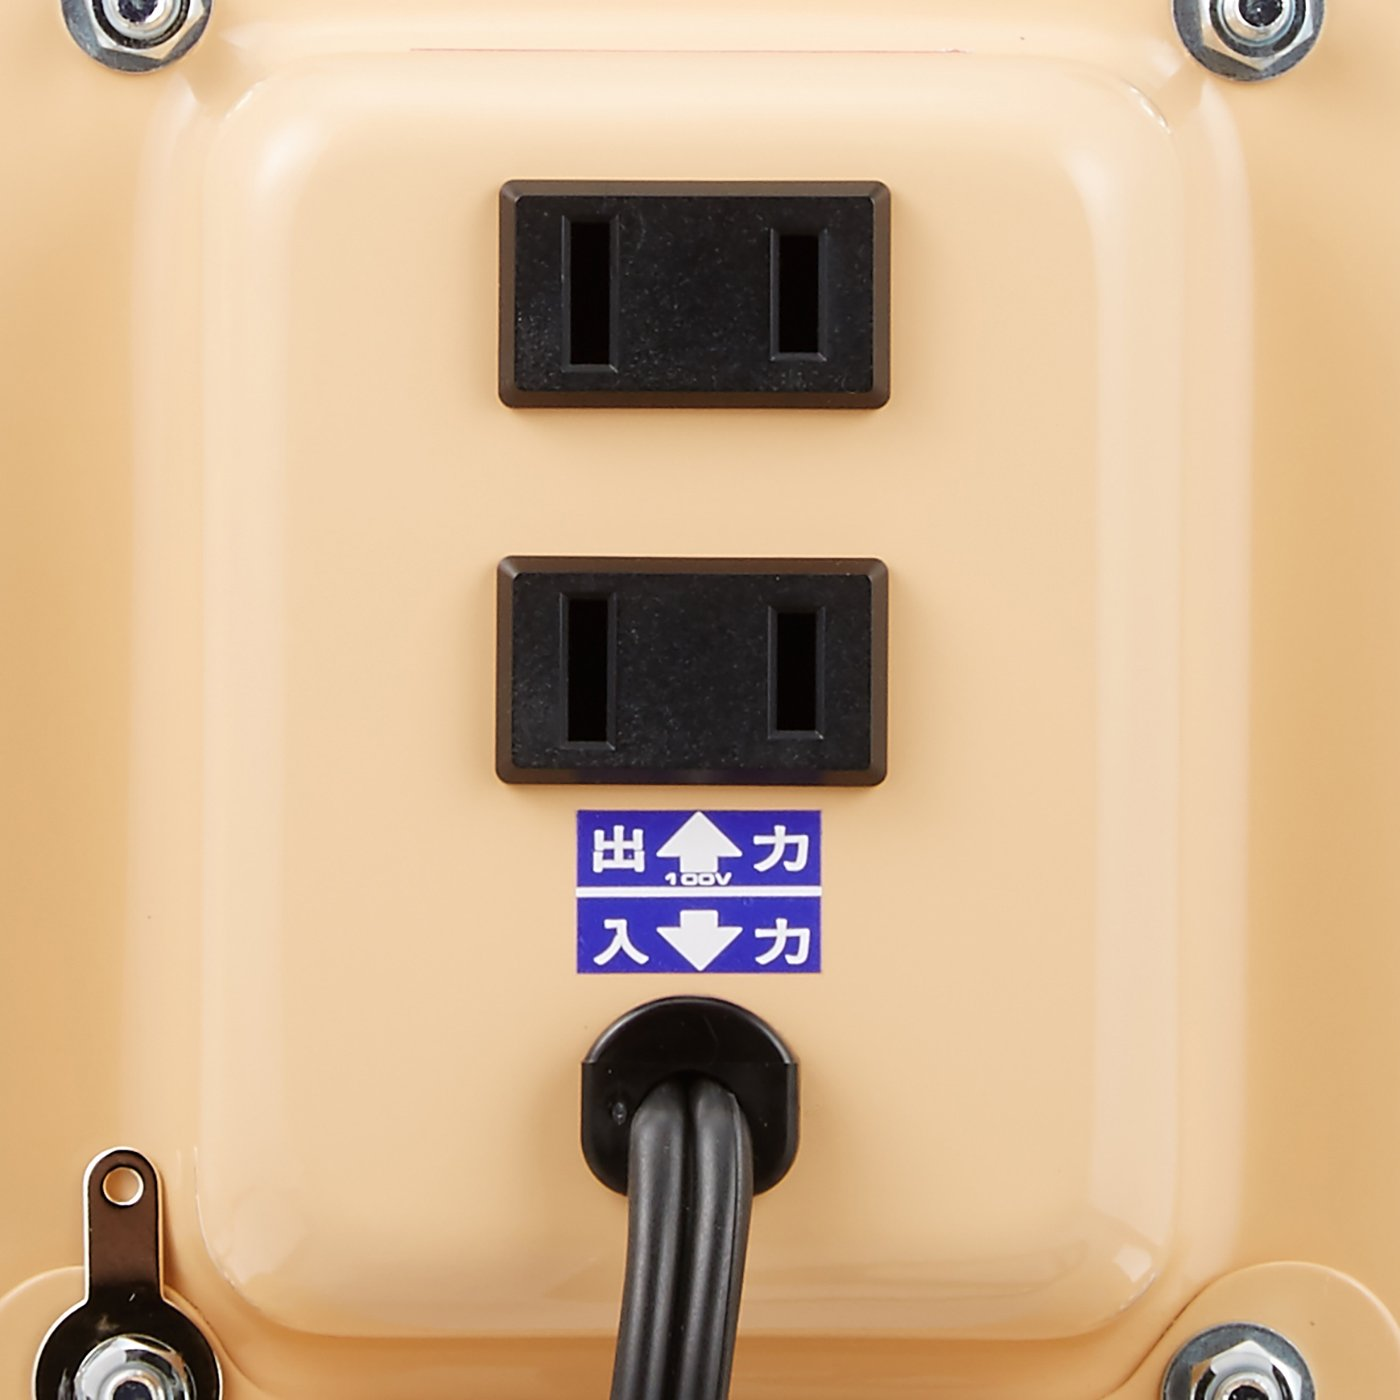 120V 100V1500W NDF-1500U NISSYO Industrial Transformer NDF Series Voltage Down Japan Import